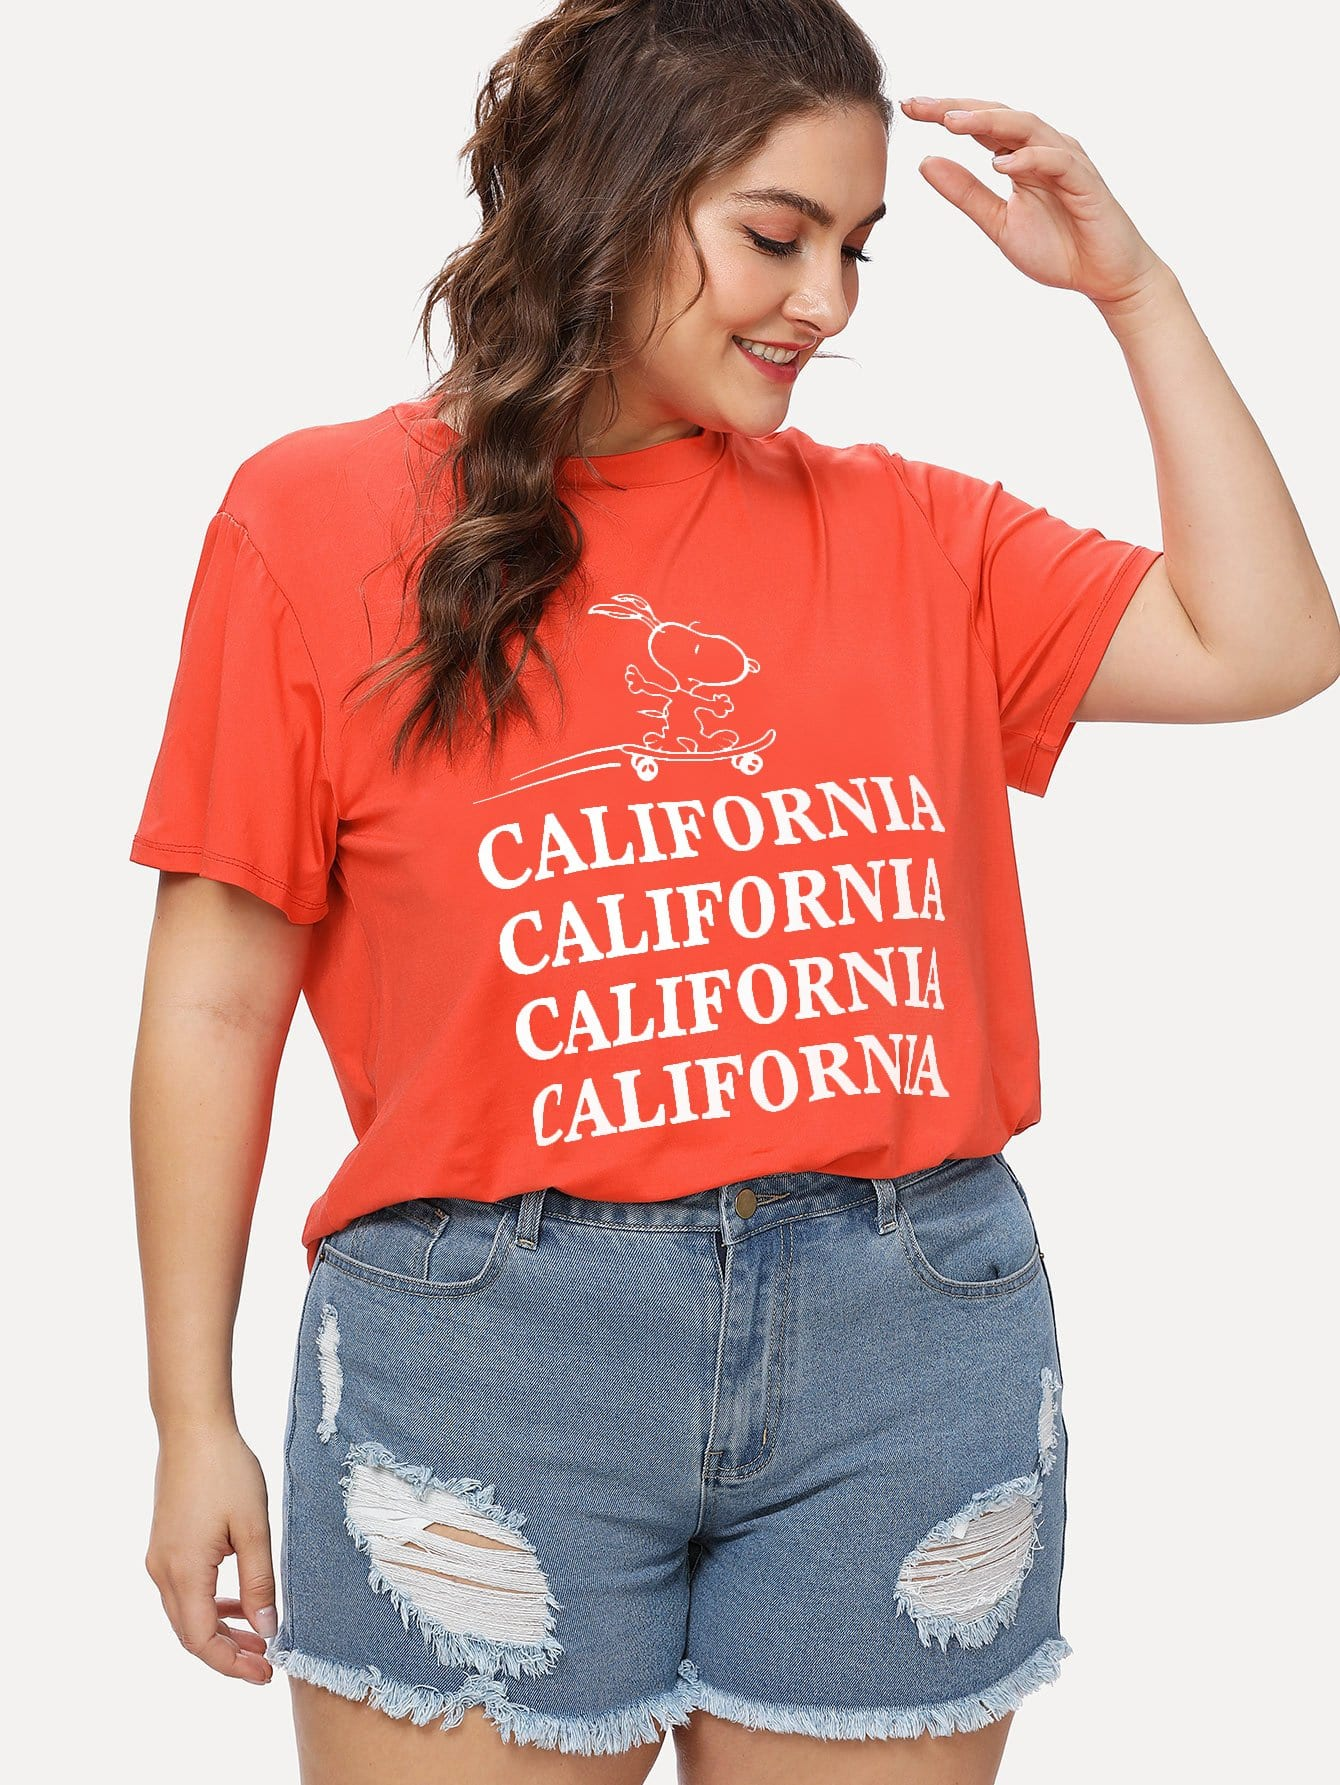 California Cartoon Graphic Tee ar 3510w